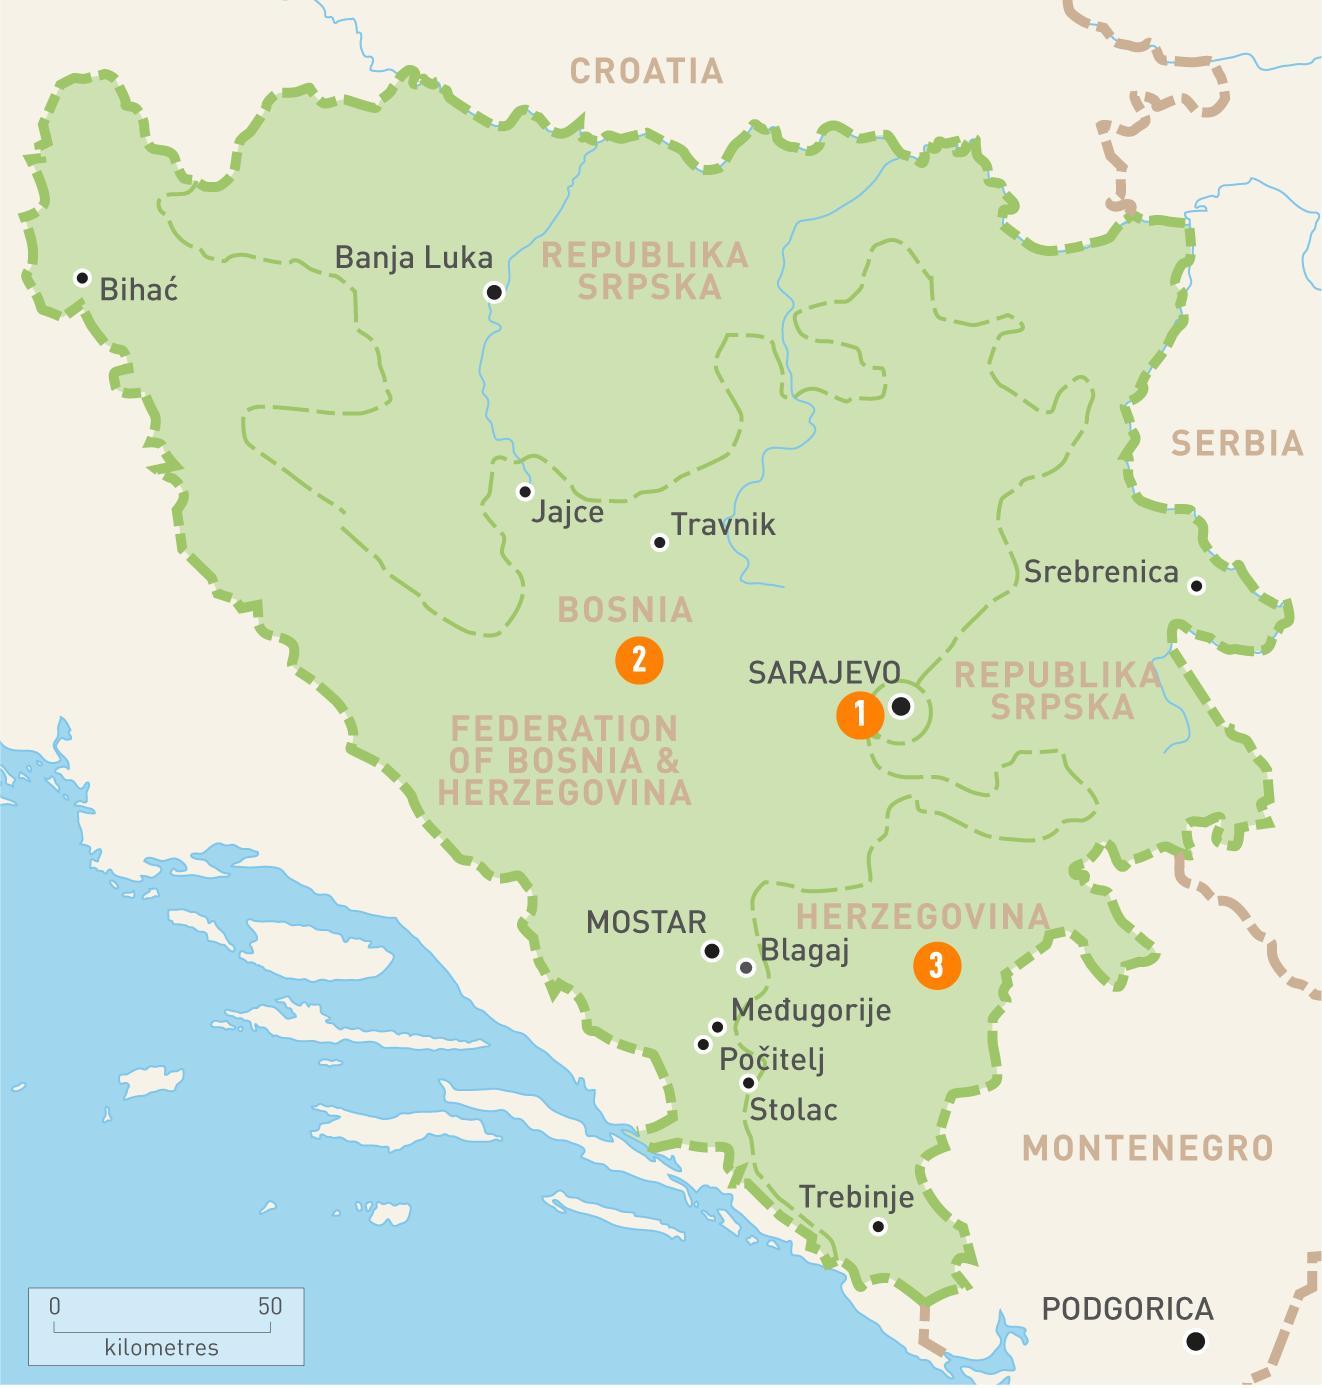 Sarajevo Bosnia map - Map of sarajevo Bosnia (Southern ... on istanbul map, gibraltar on map, budapest map, bosnia map, belgrade map, vienna map, bosnia and herzegovina, dublin map, serbia map, kosovo map, constantinople map, zagreb map, croatia map, balkans map, minsk map, gavrilo princip, siege of sarajevo, kiev map, yugoslavia map, skopje map, the hague map, tirana map, riga map, bosnian war,